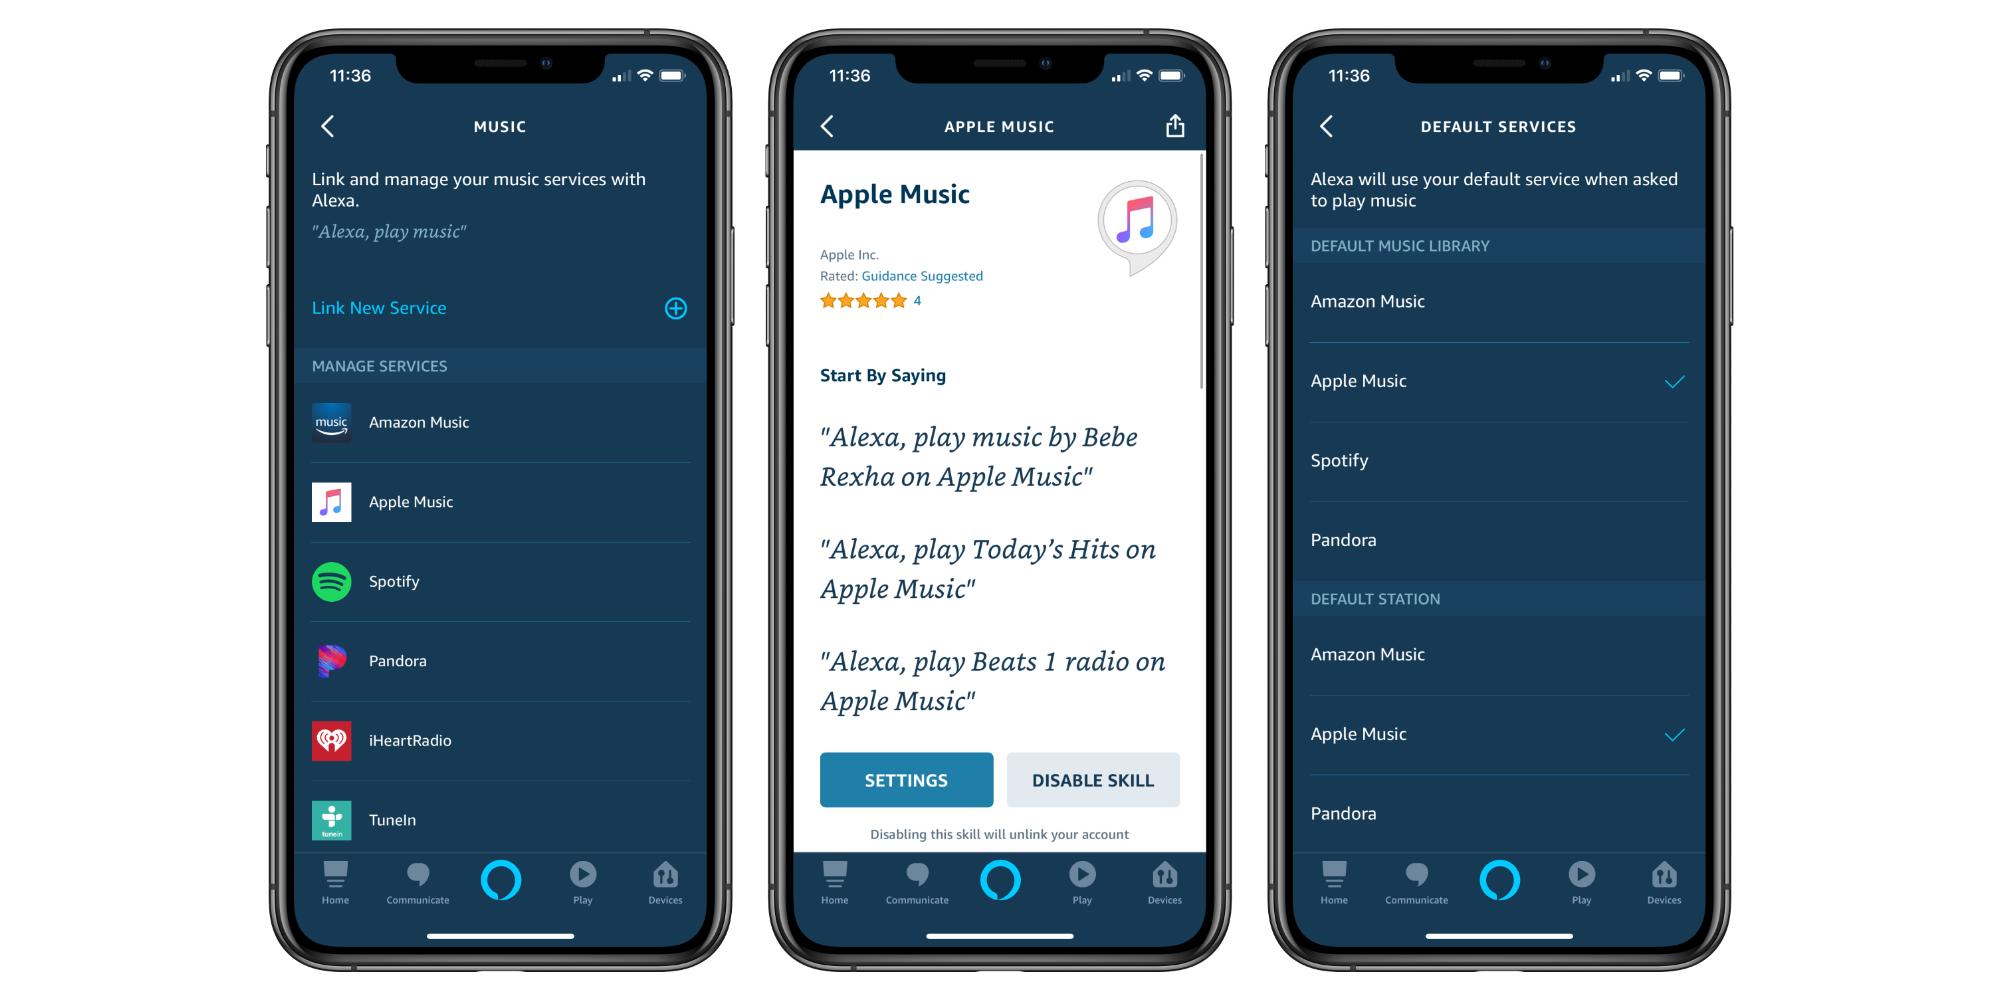 Apple Music on Alexa